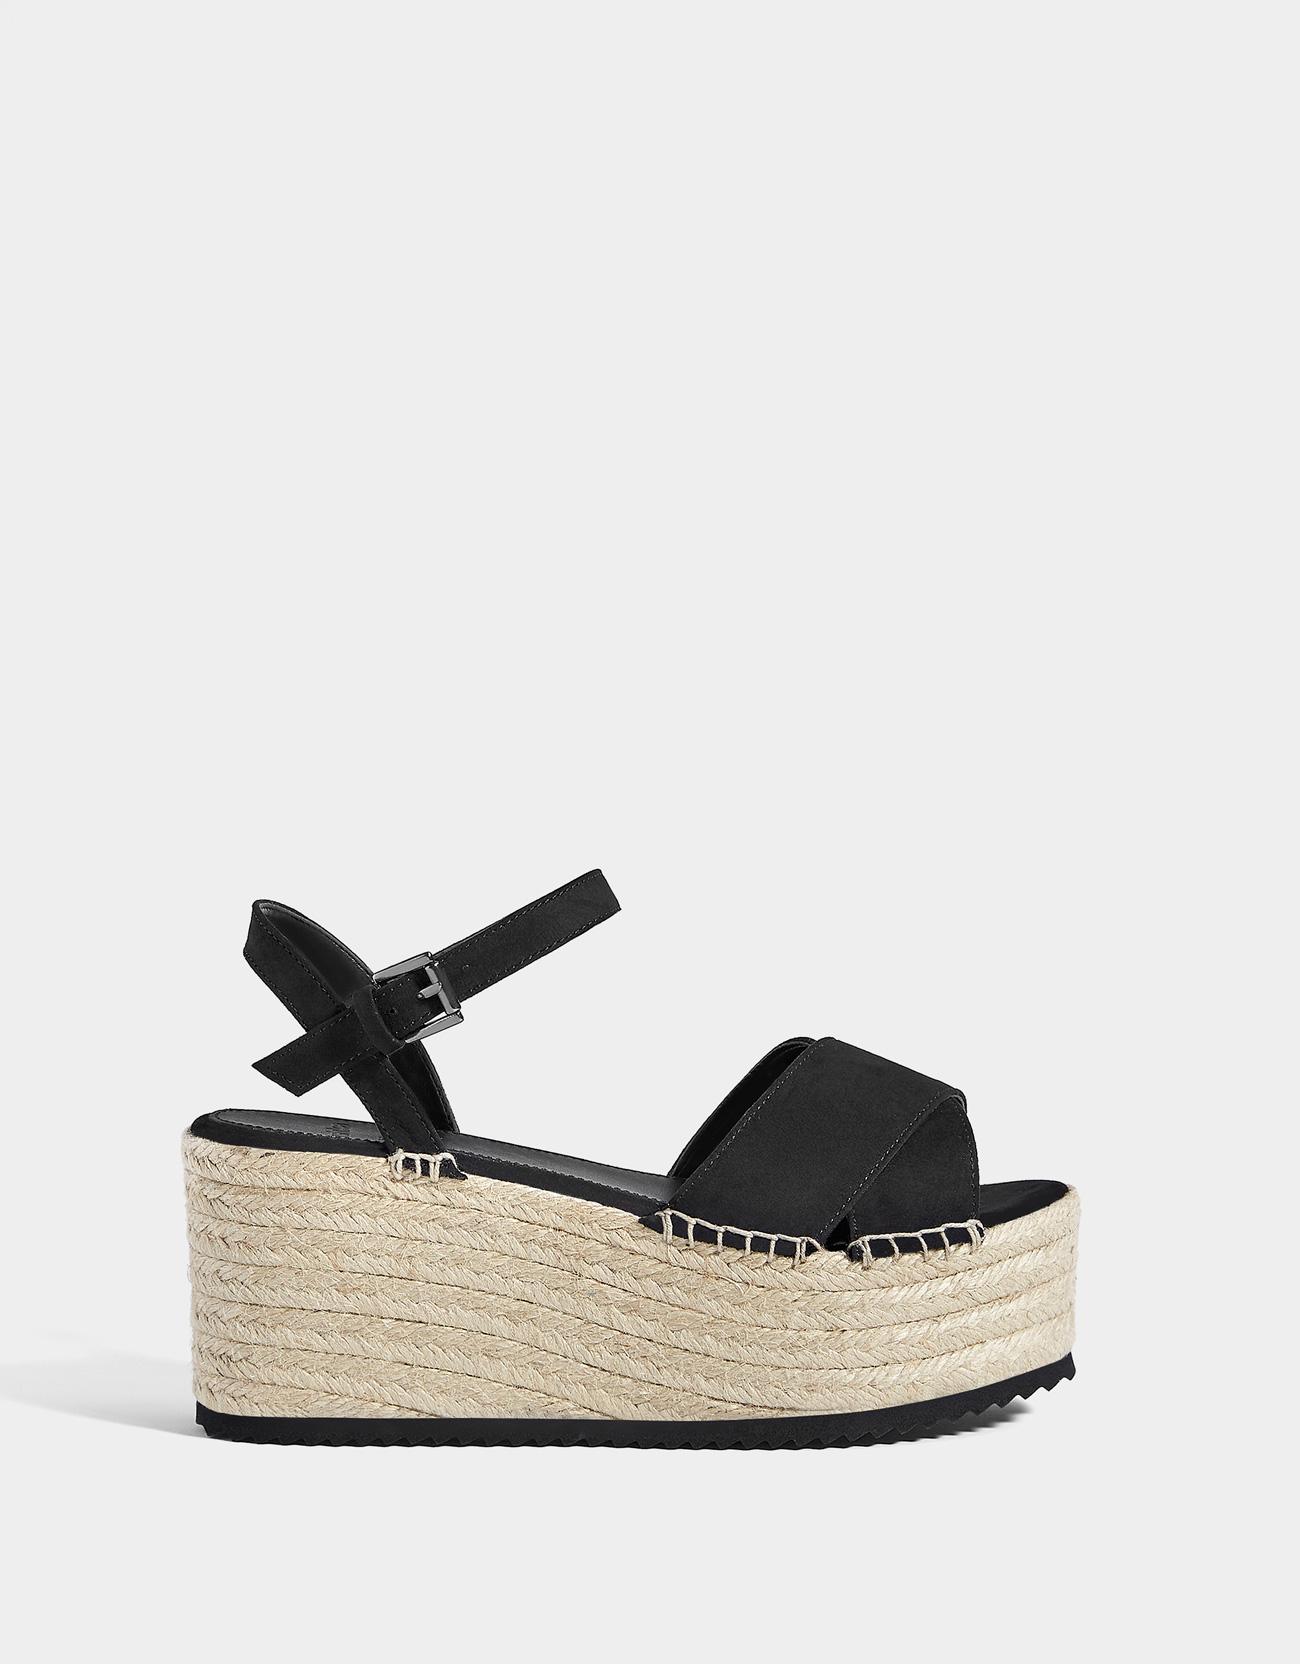 51e43caed50b Black jute platform sandals - Platforms - Bershka France